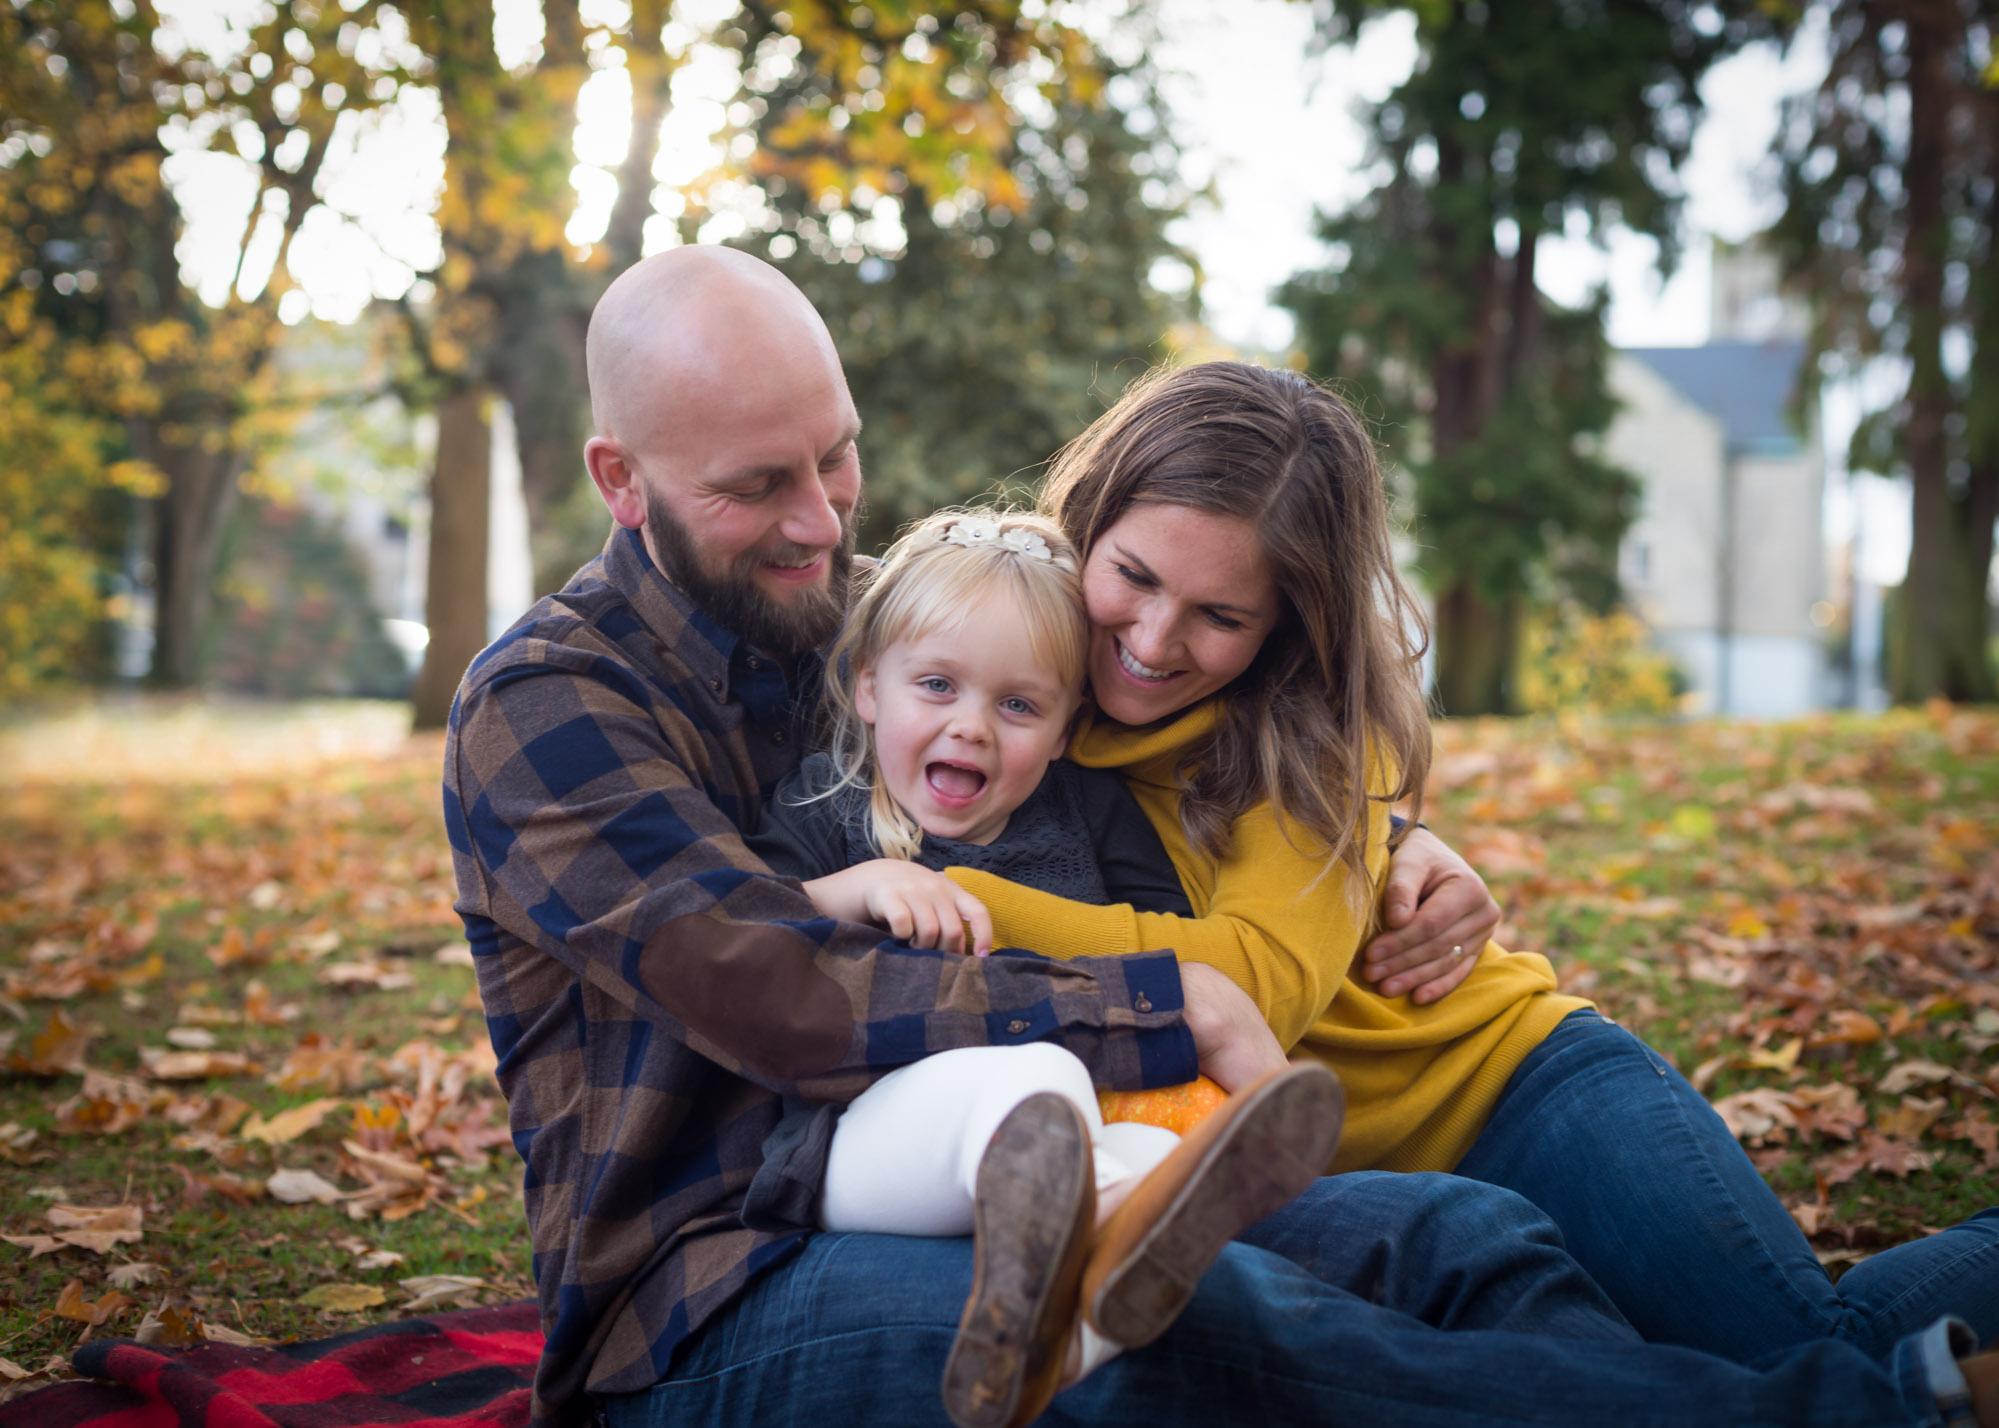 tacoma-playful-family-photography-session-1.jpg